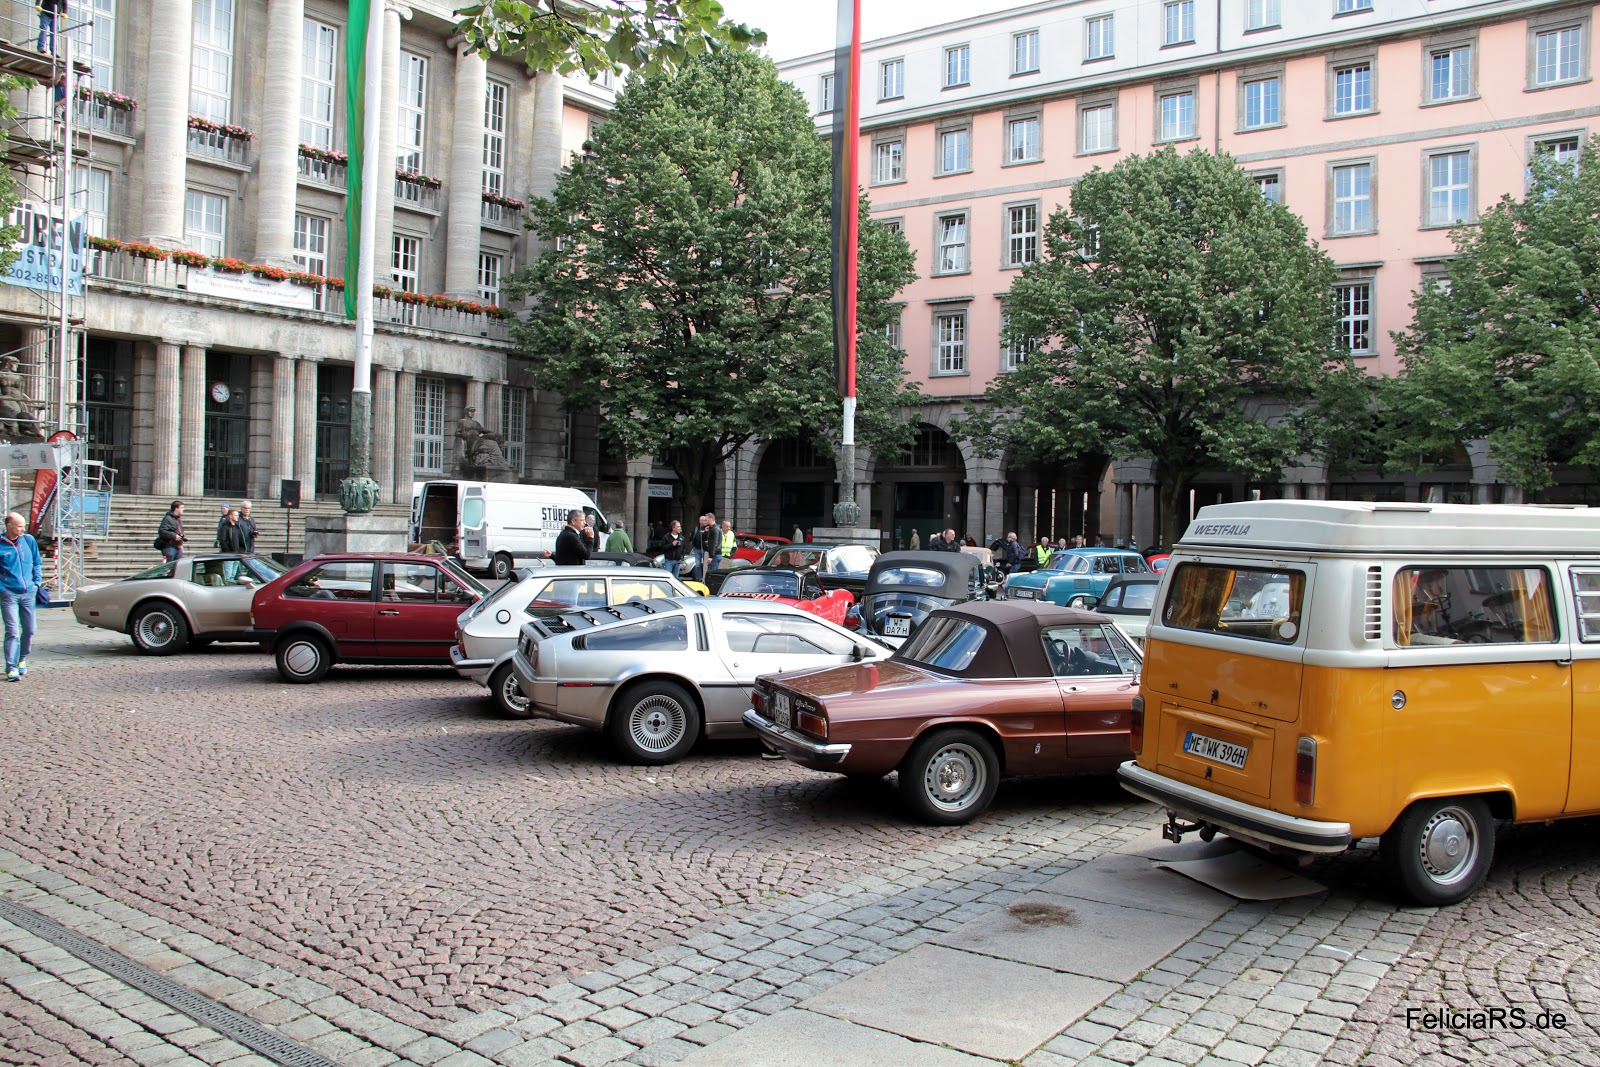 Johannes Rau Platz Wuppertal Barmen